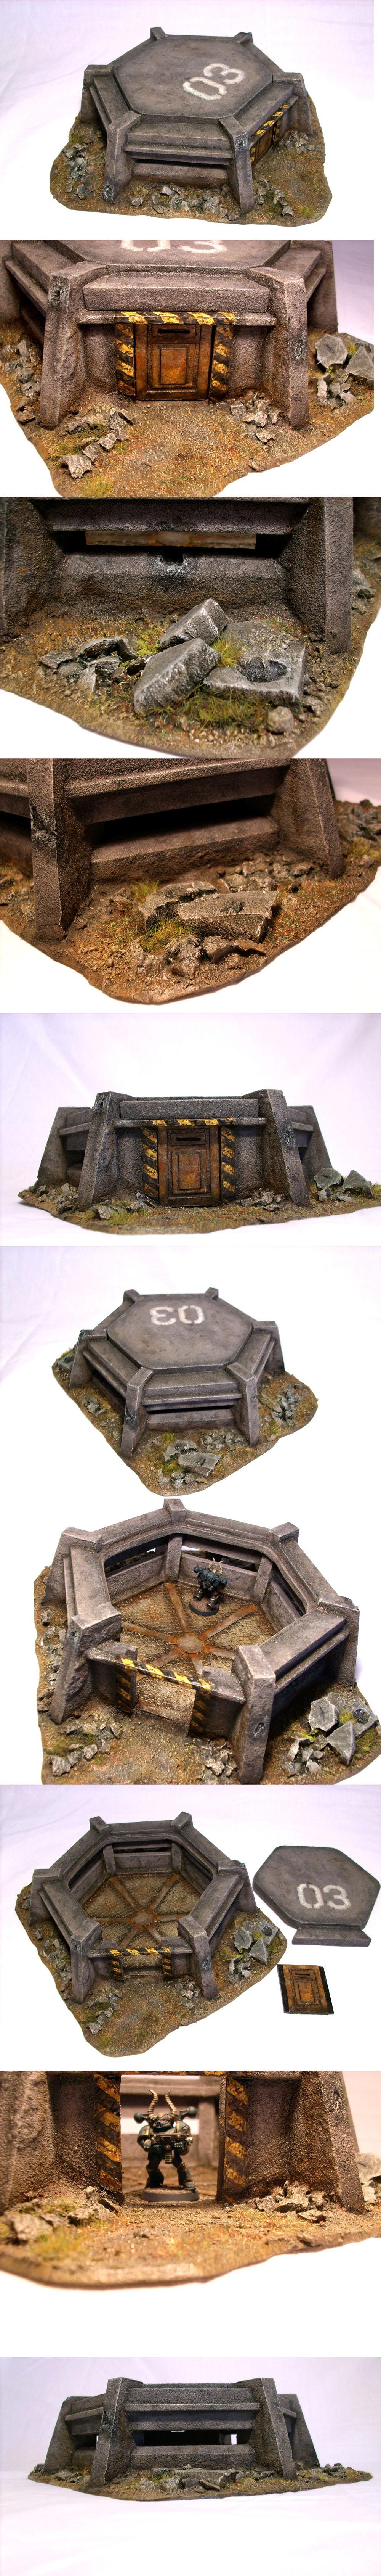 Warhammer 40K Bunker